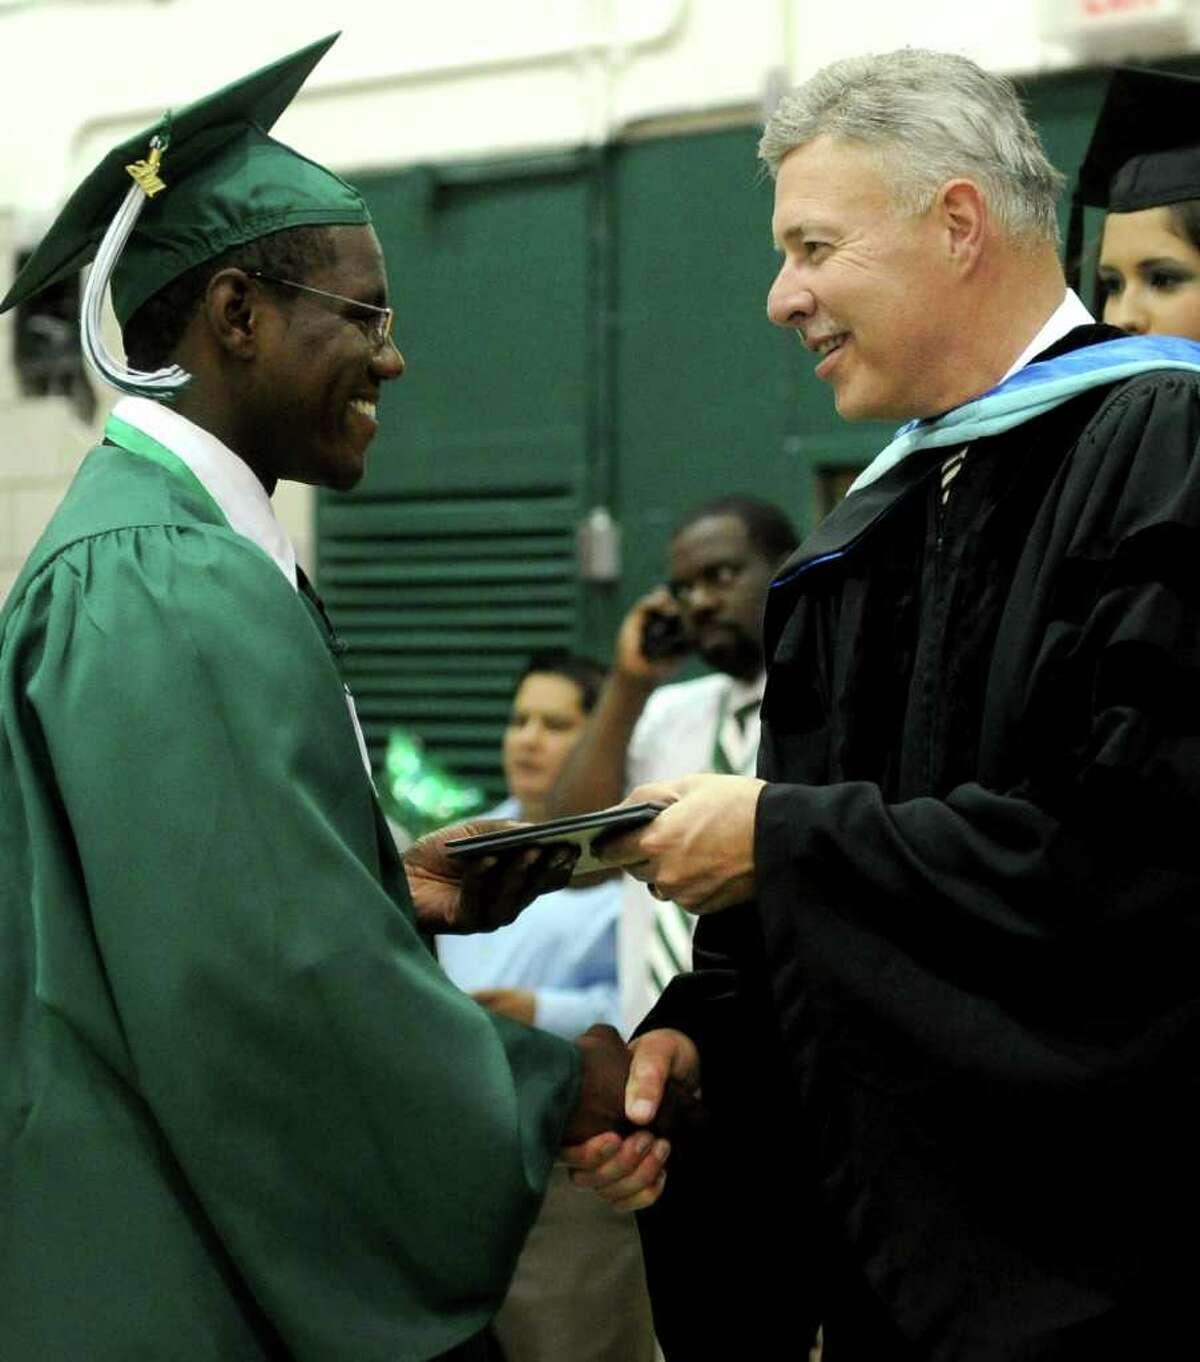 Norwalk High School's graduation ceremony on Wednesday, June 22, 2011.